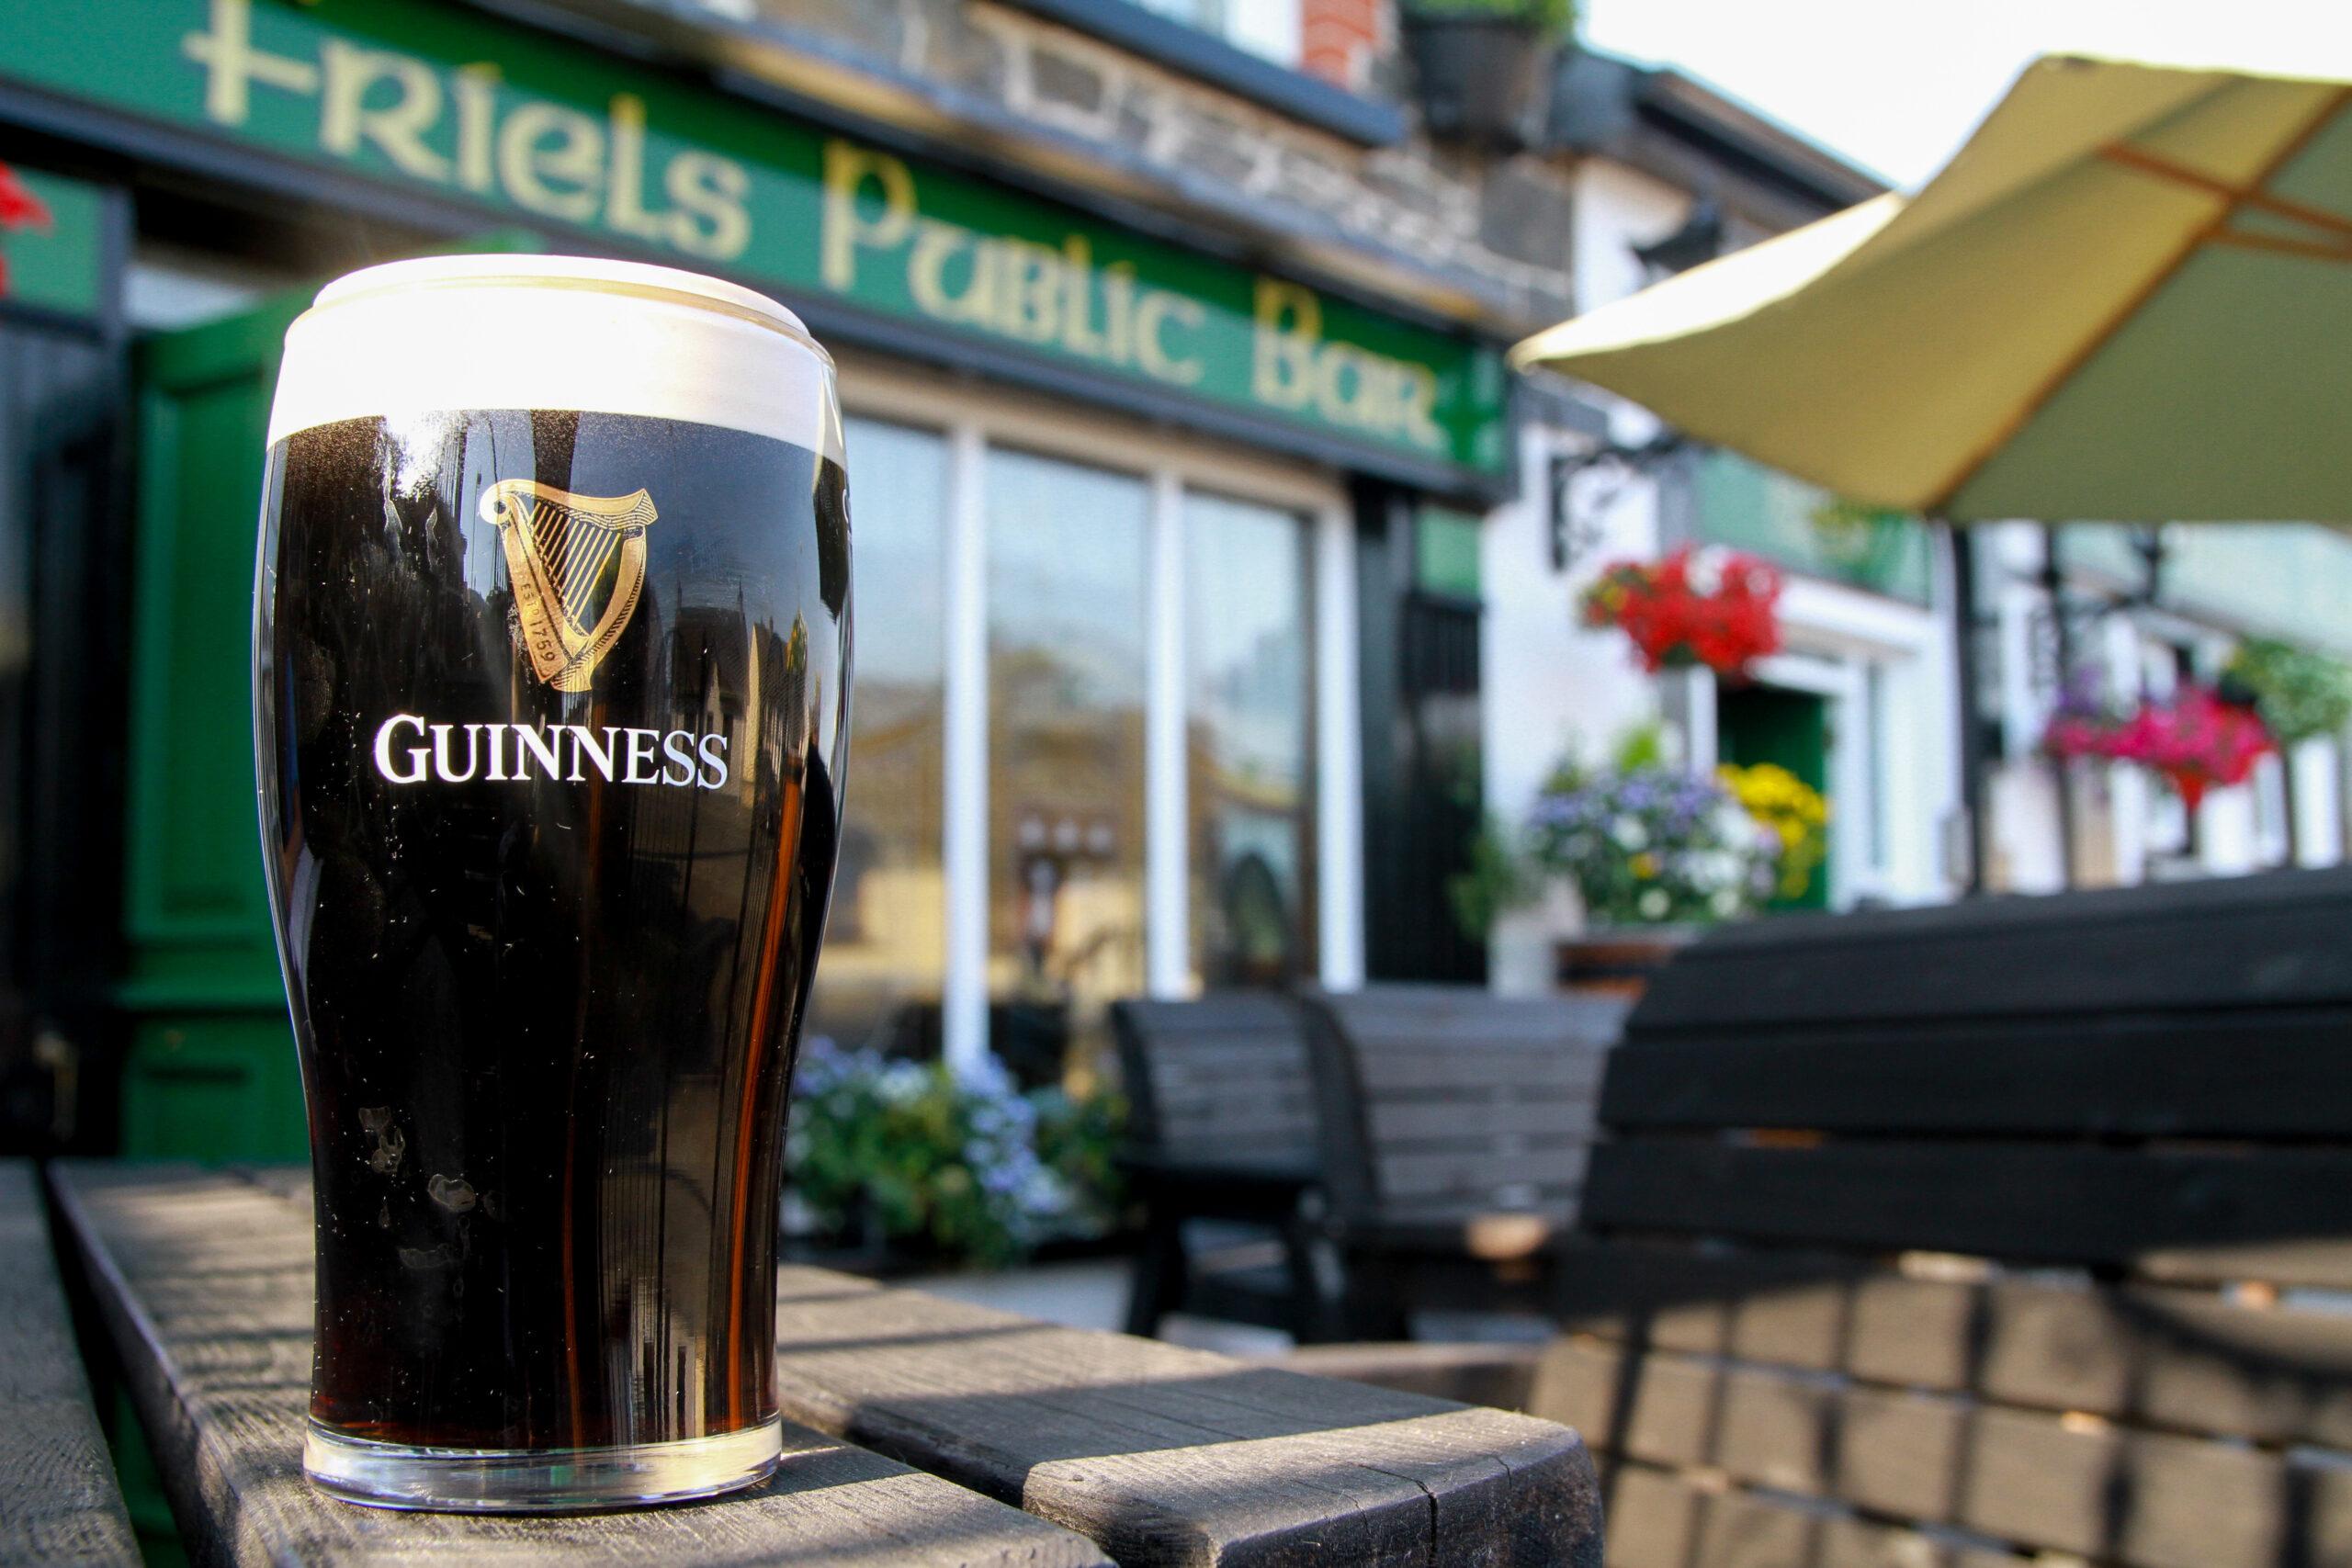 Pint of Guinness outside at Friels Bar Swatragh